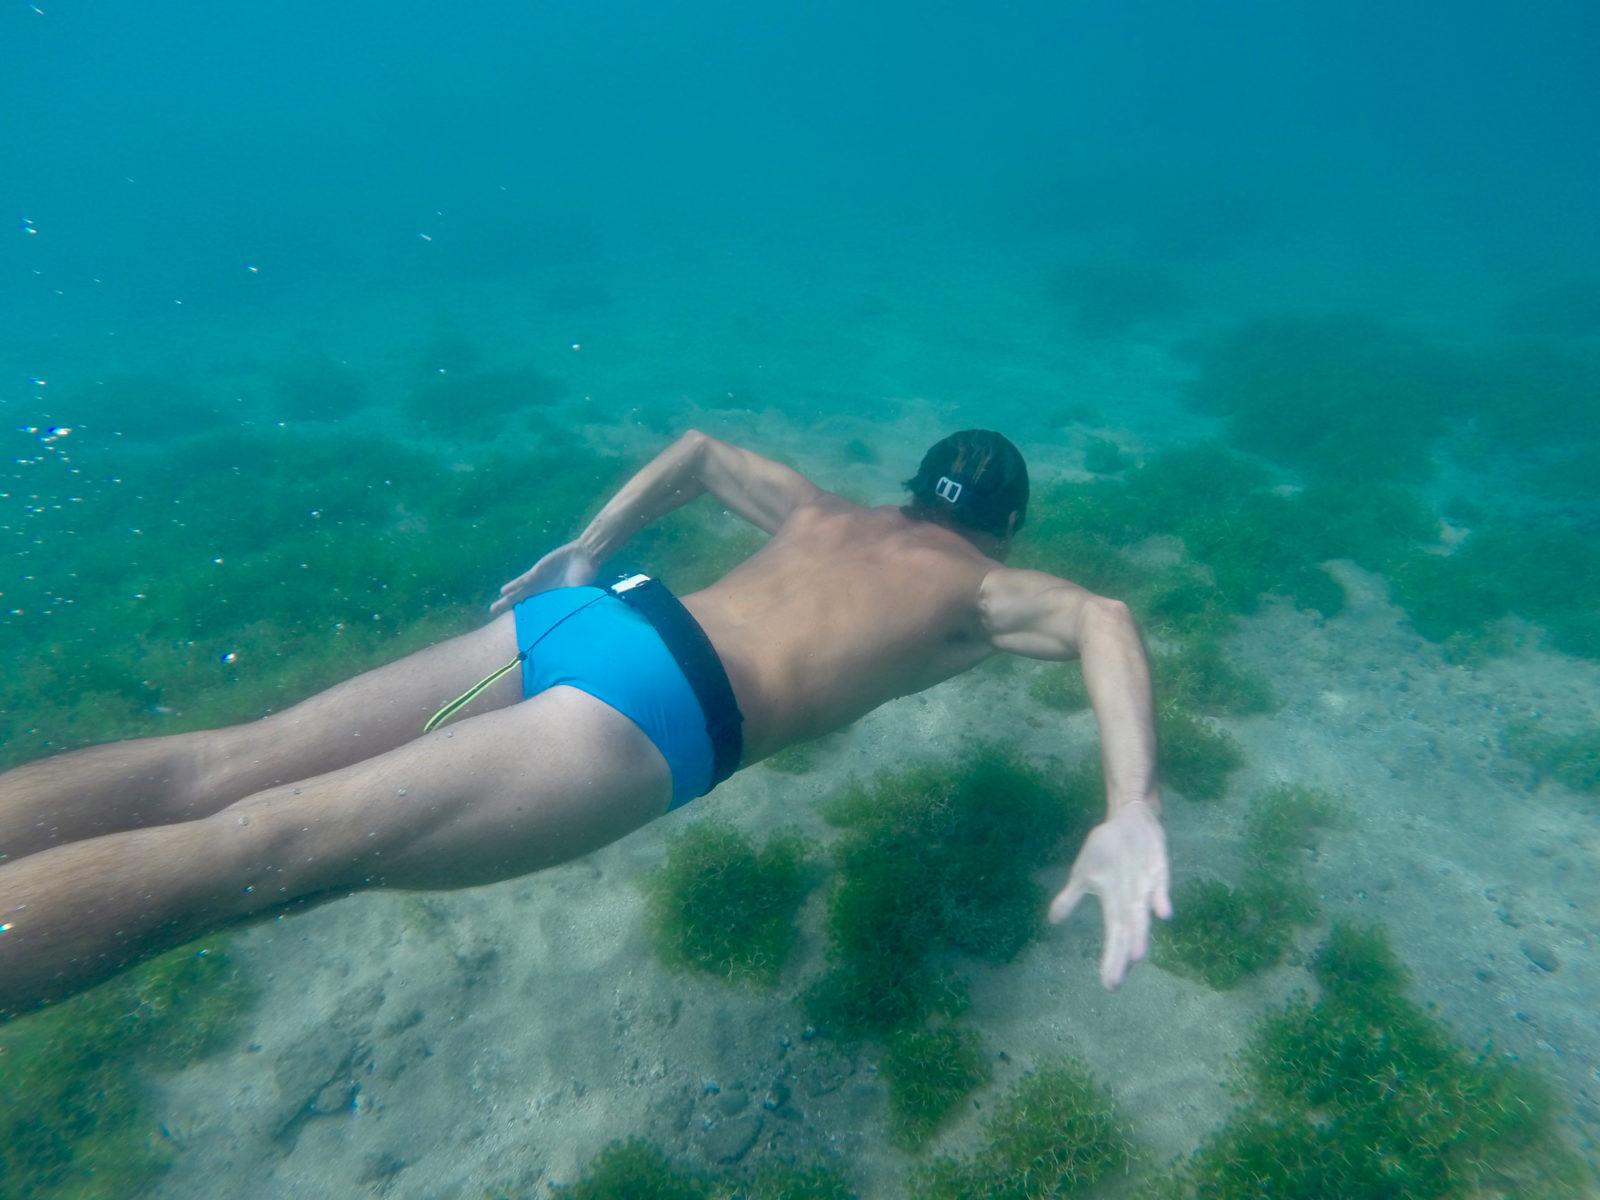 salvagente cintura autogonfiabile tascabile per nuoto boeo